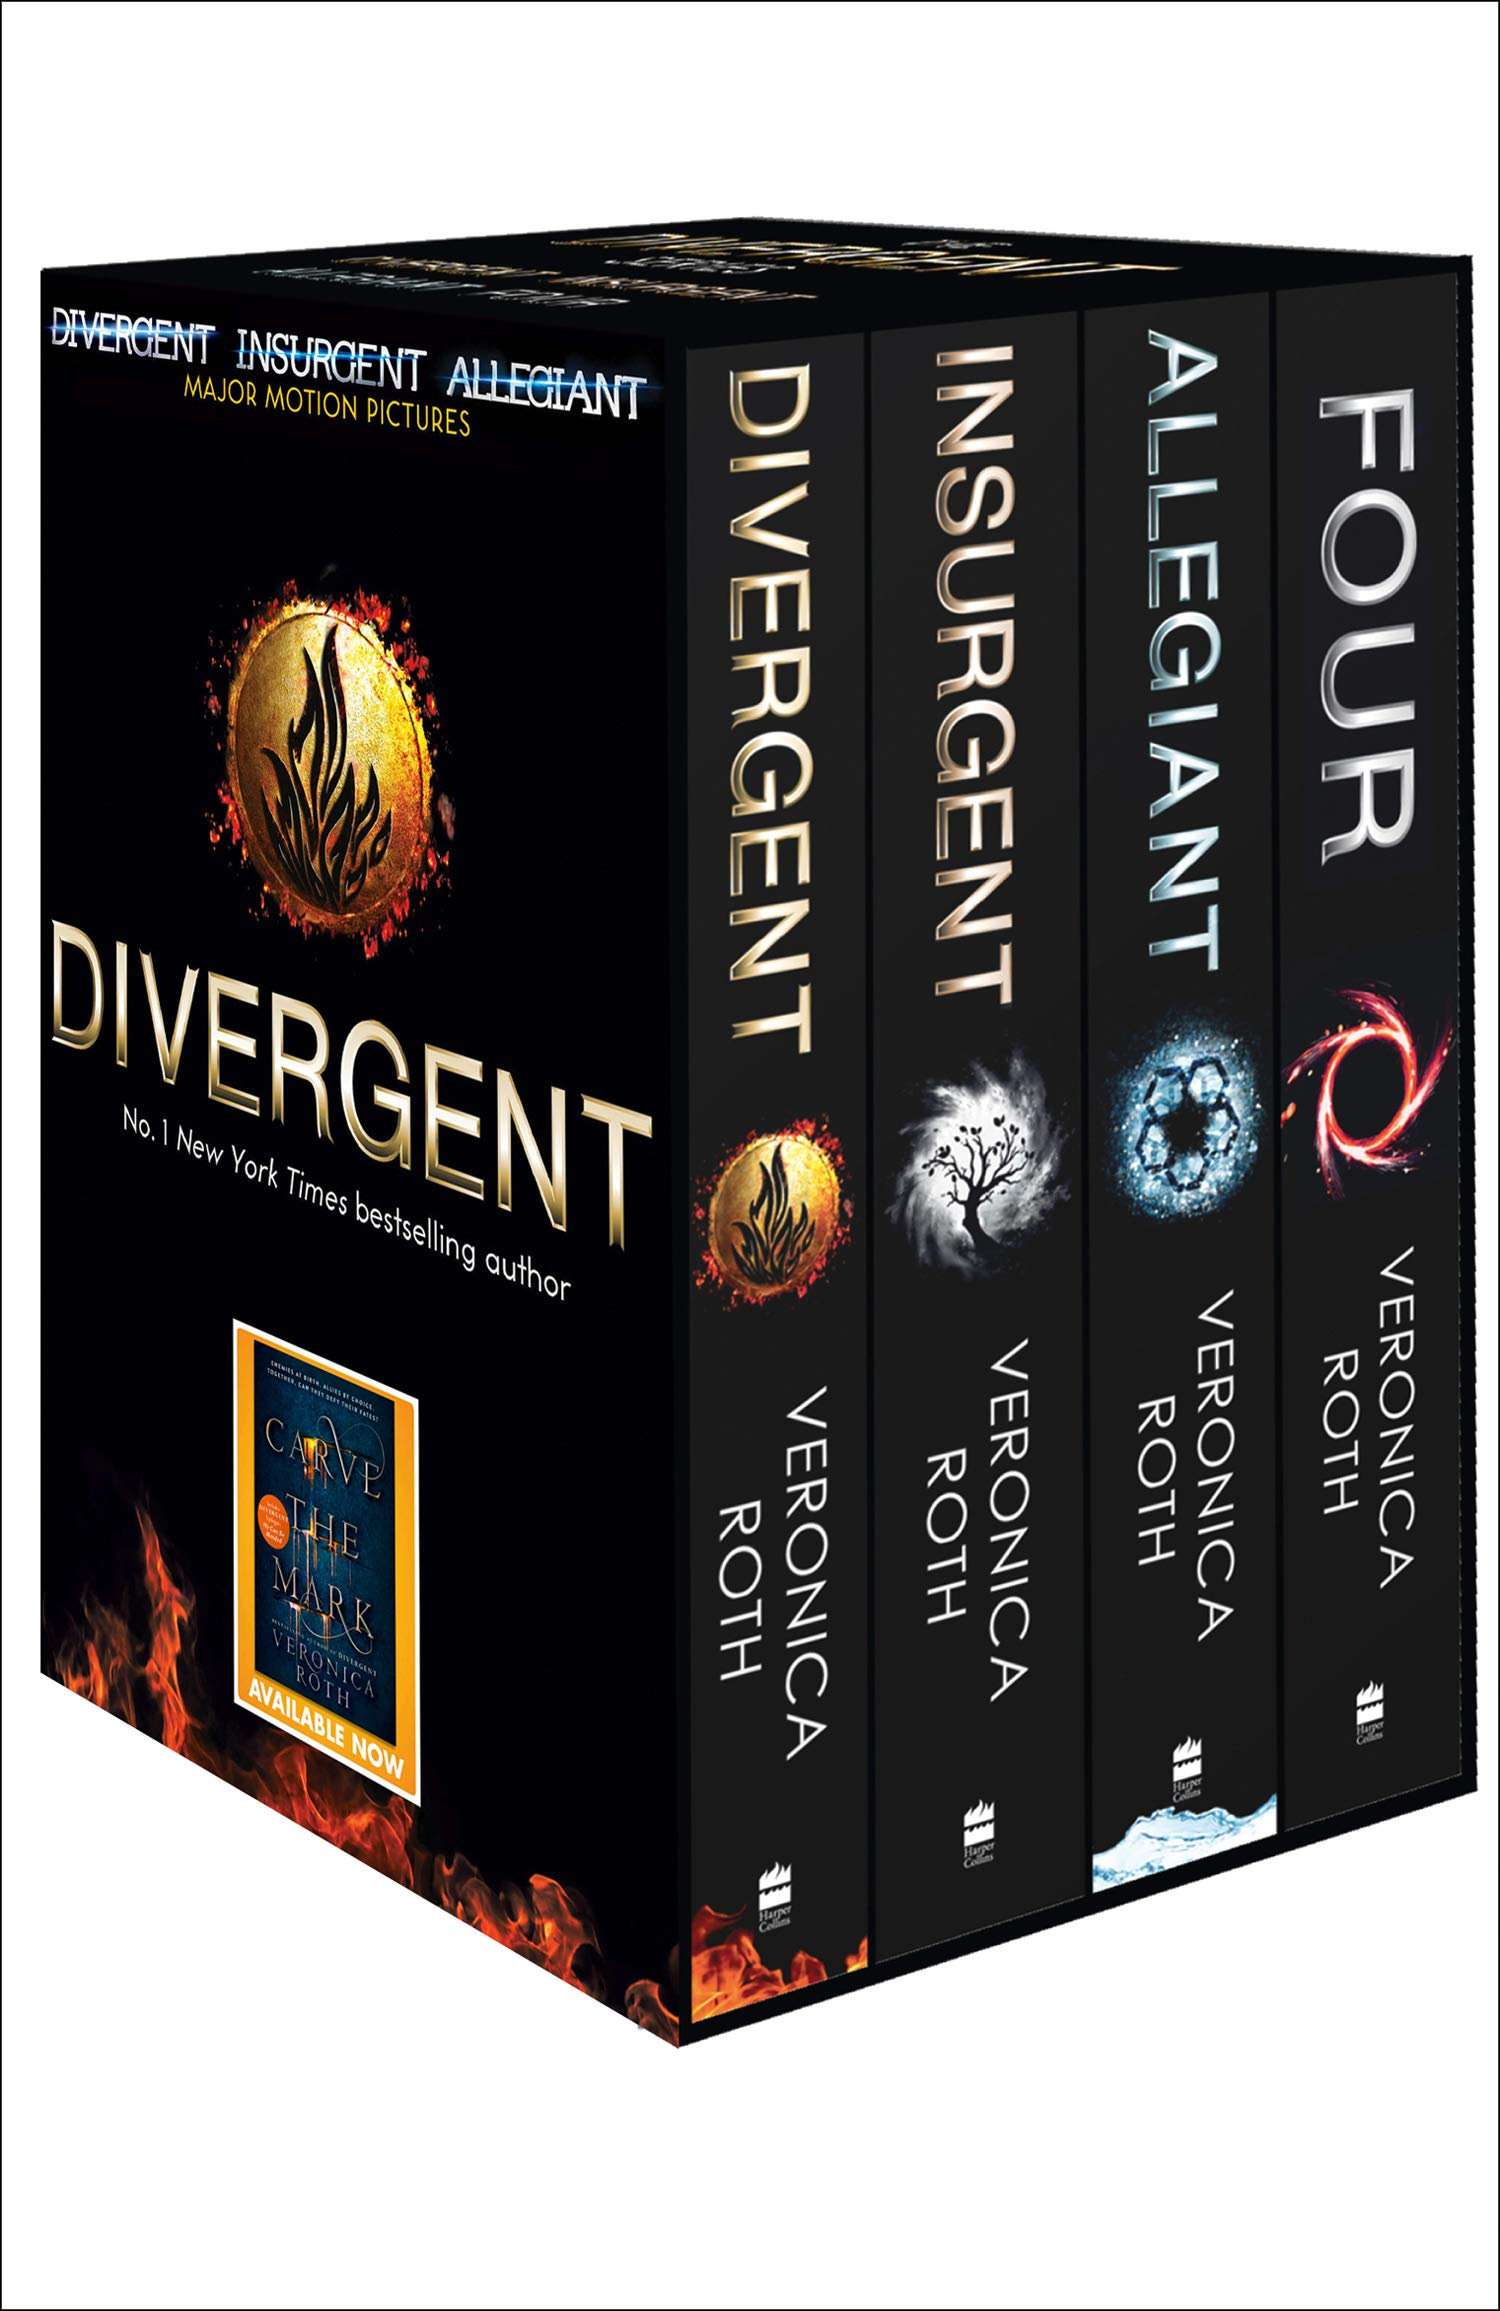 Divergent Series Box Set - Books 1-4: Amazon.es: Roth, Veronica: Libros en idiomas extranjeros